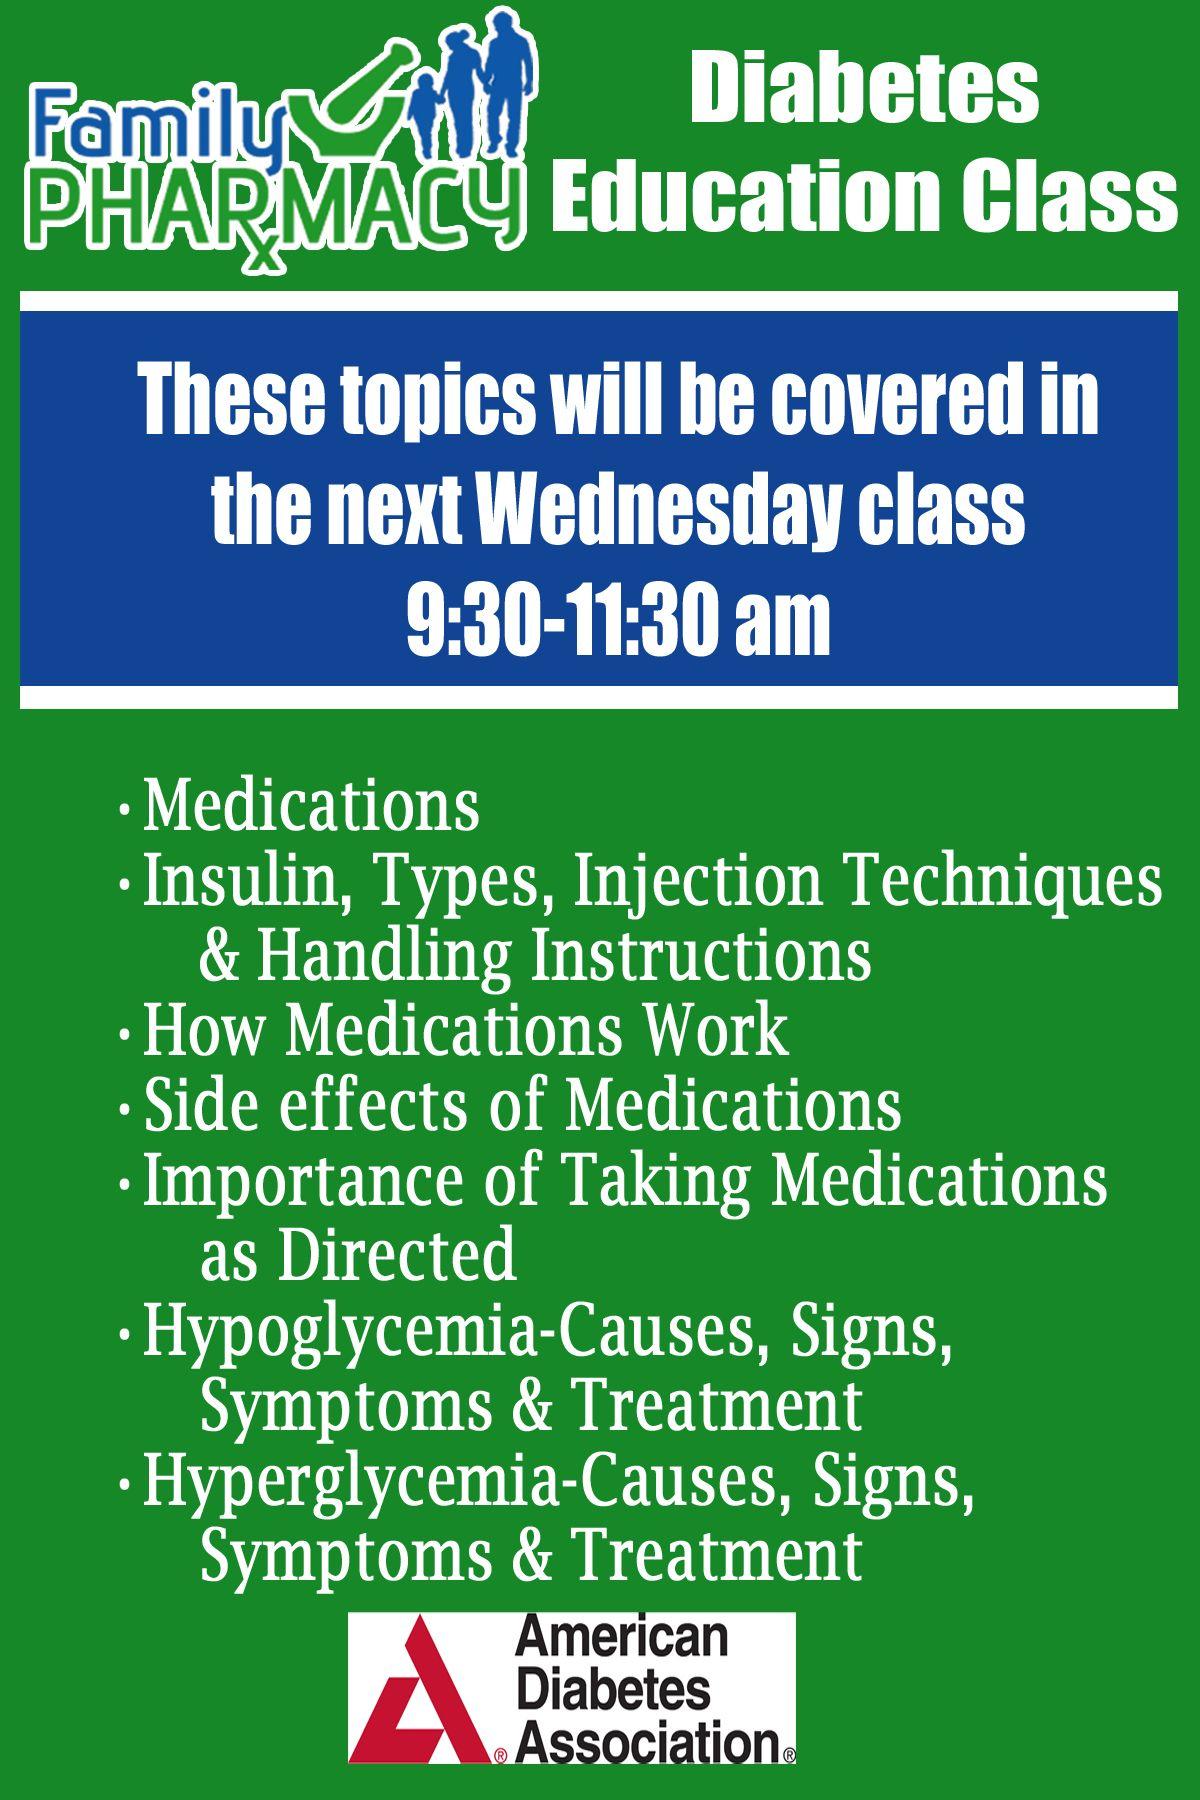 #Diabetes #Education Class